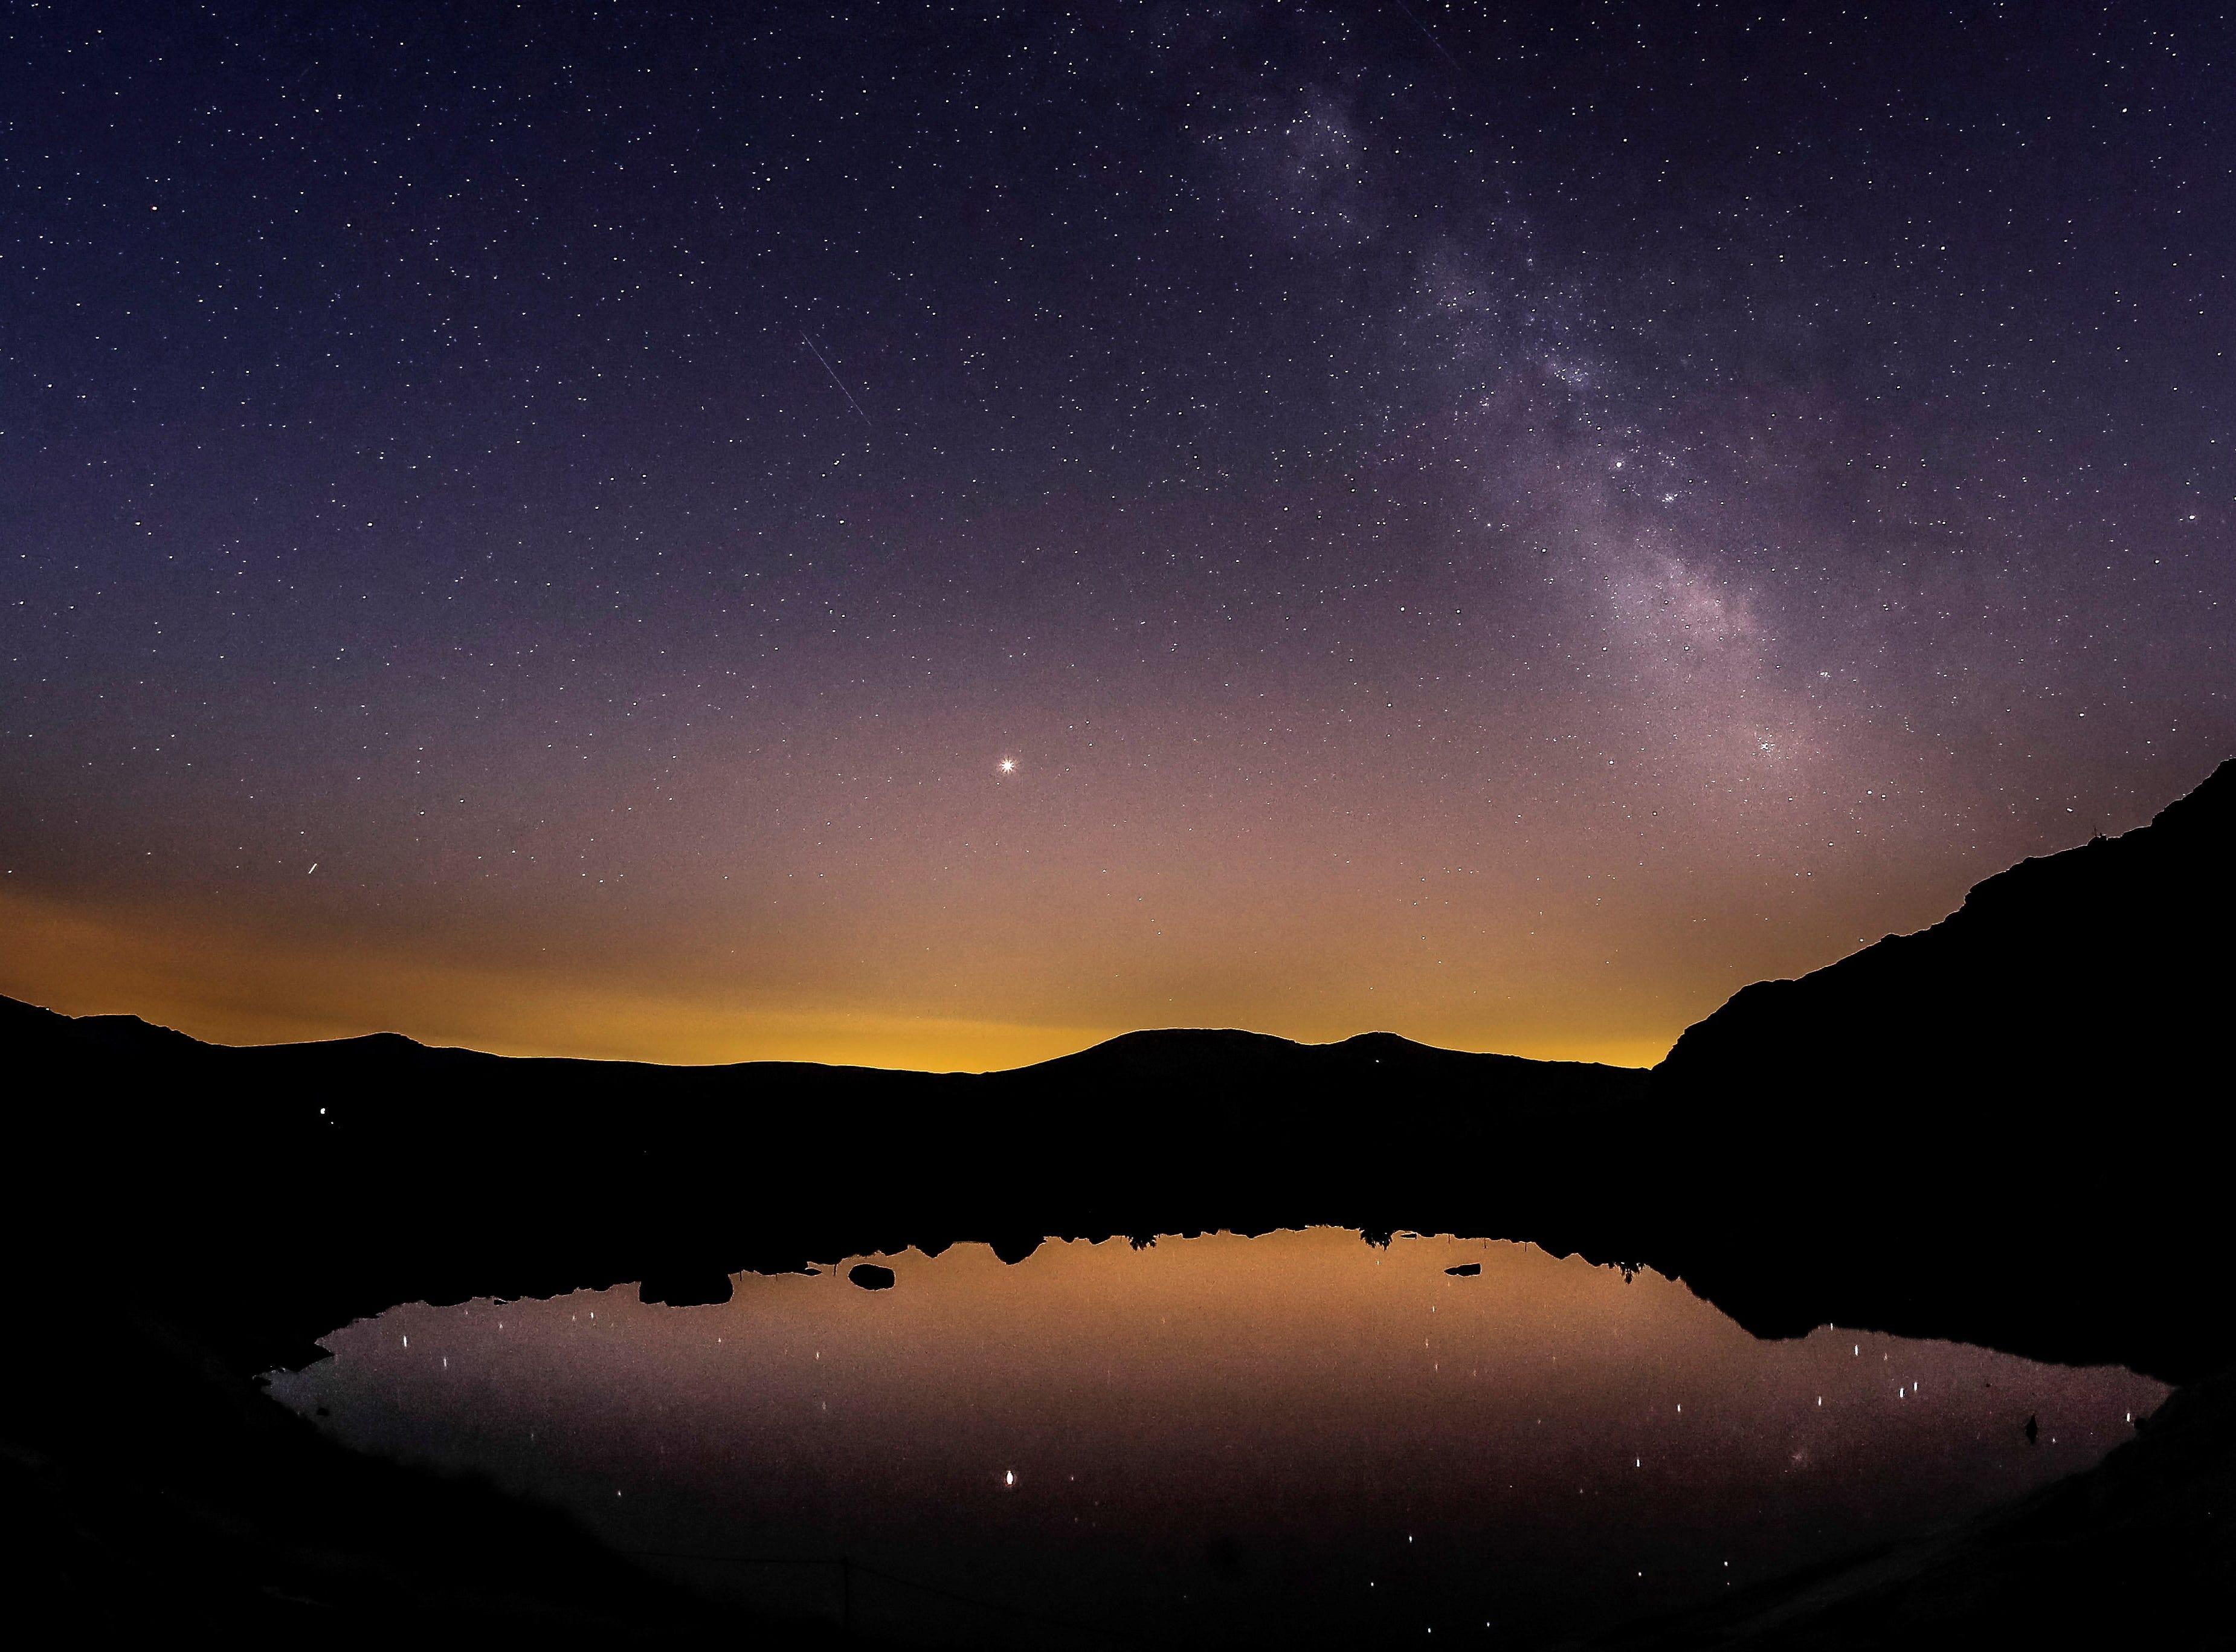 Aug. 15, 2018: View of the Milky Way at dawn at the Penalara Lagoon in Madrid, Spain.